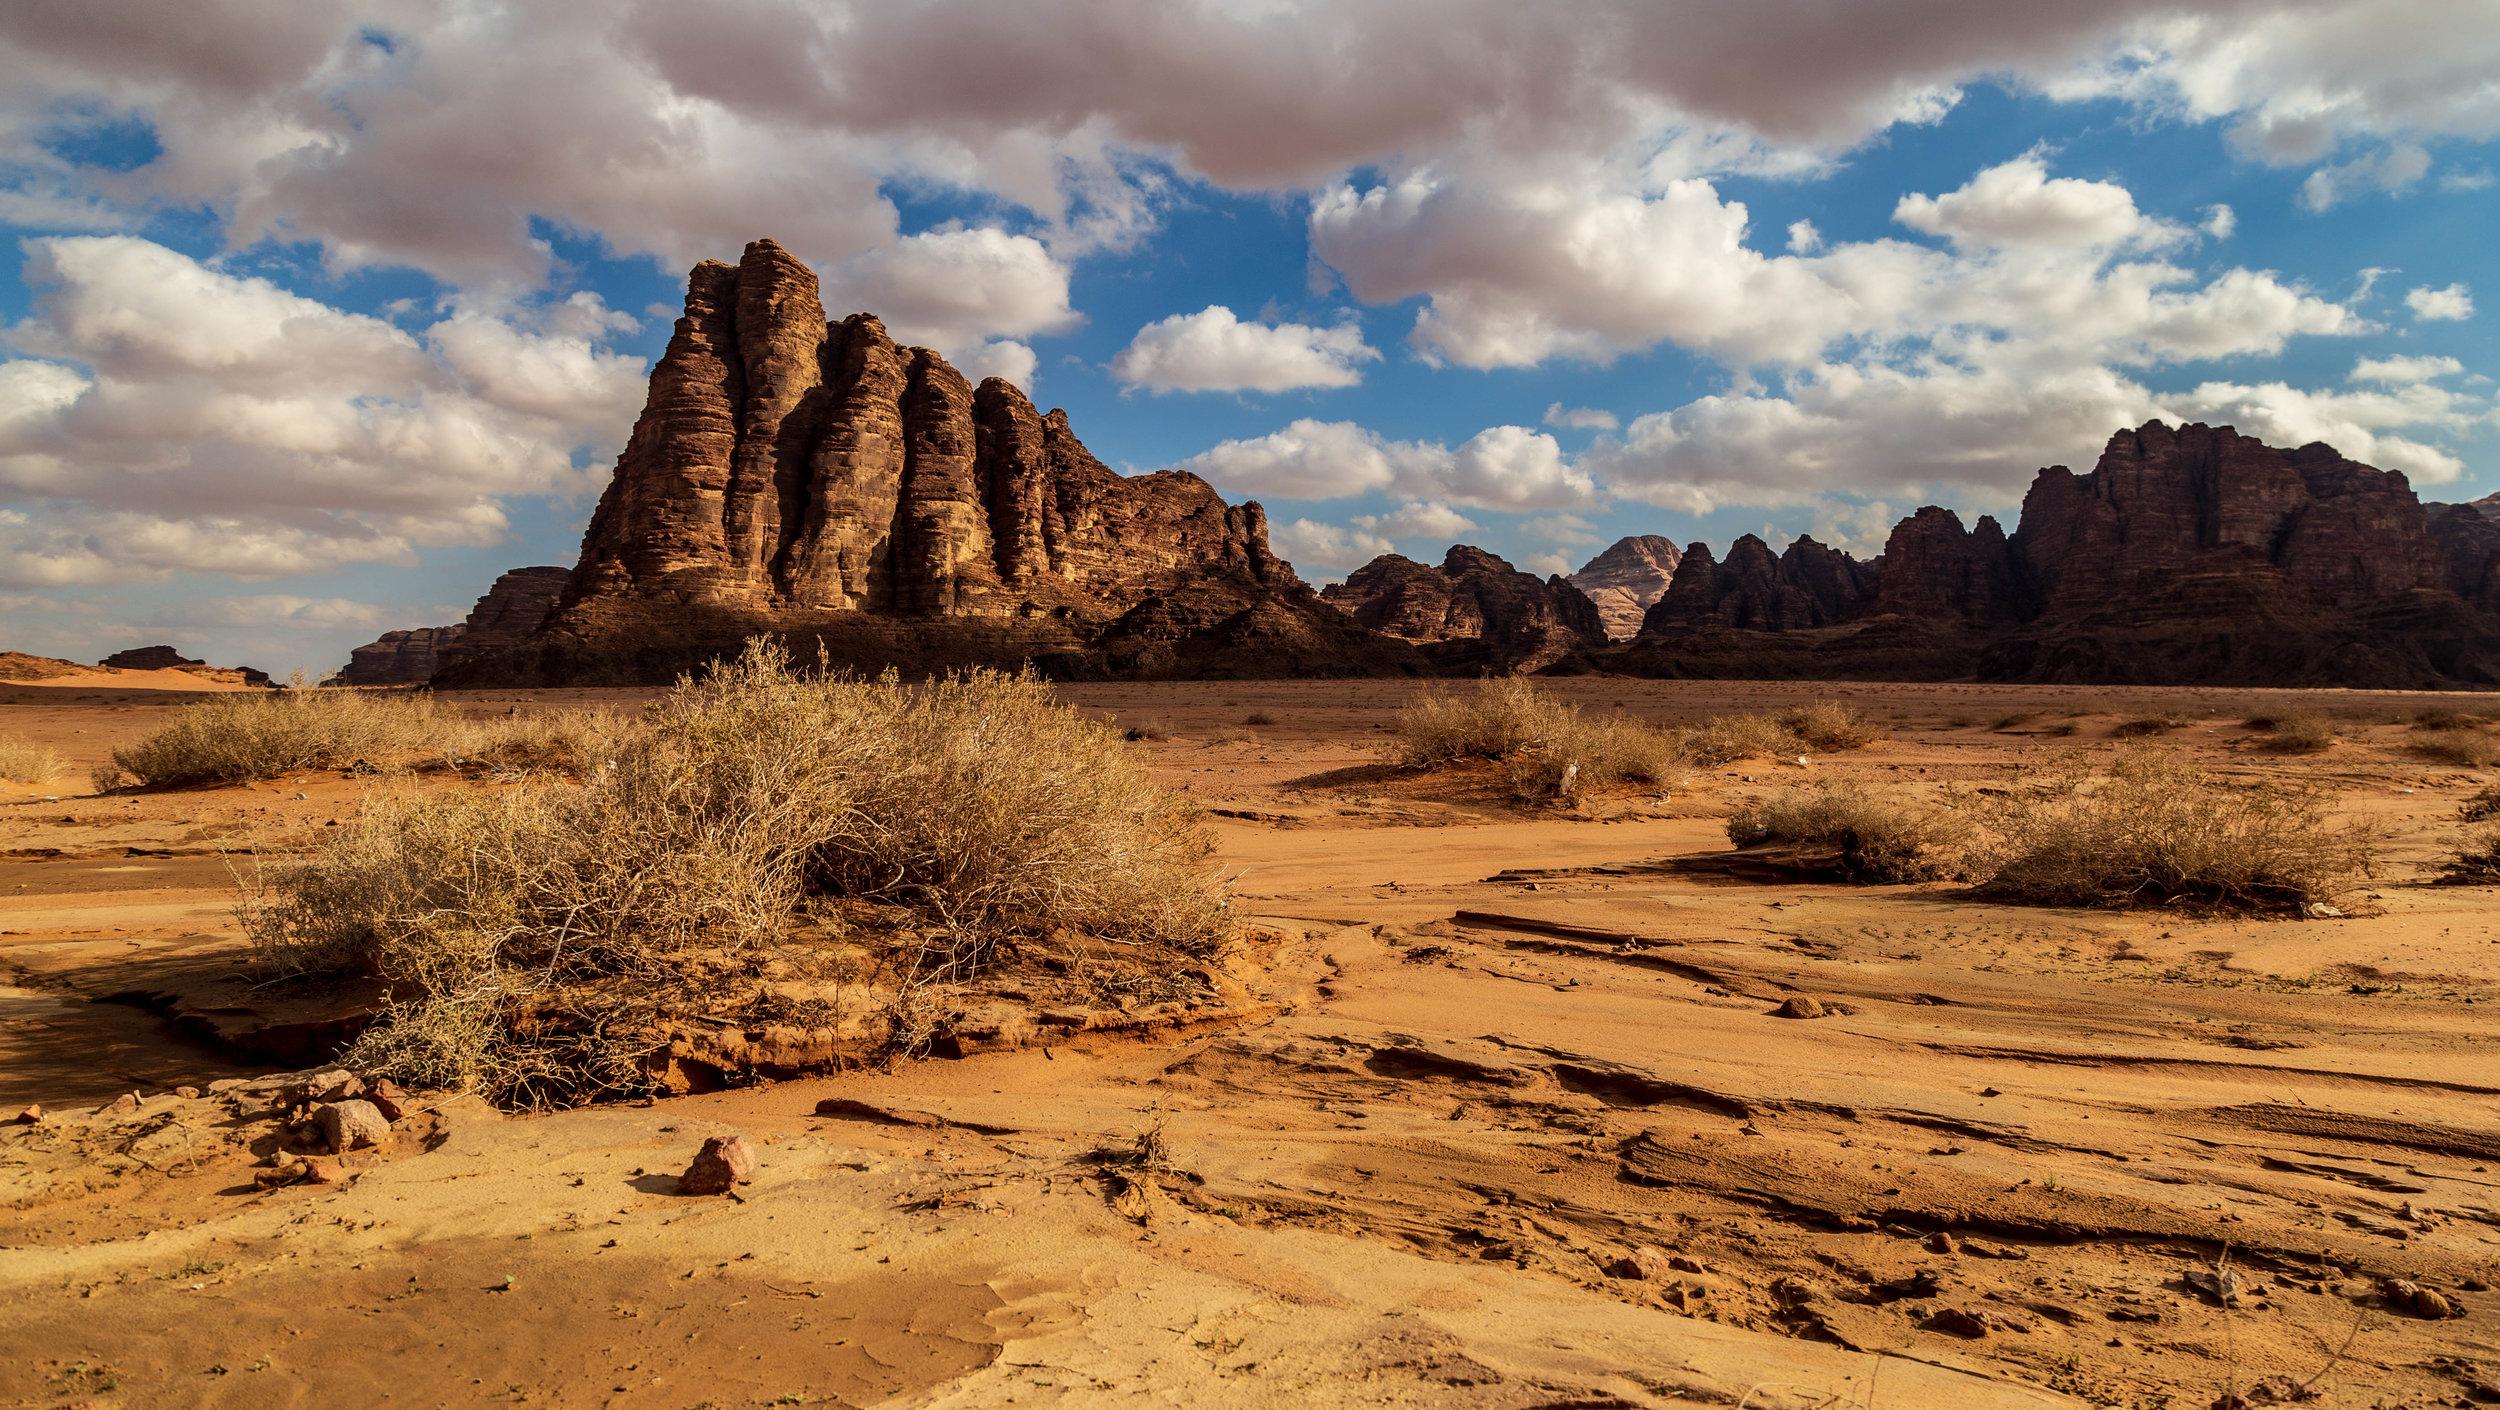 The Seven Pillars of Wisdom at Wadi Rum